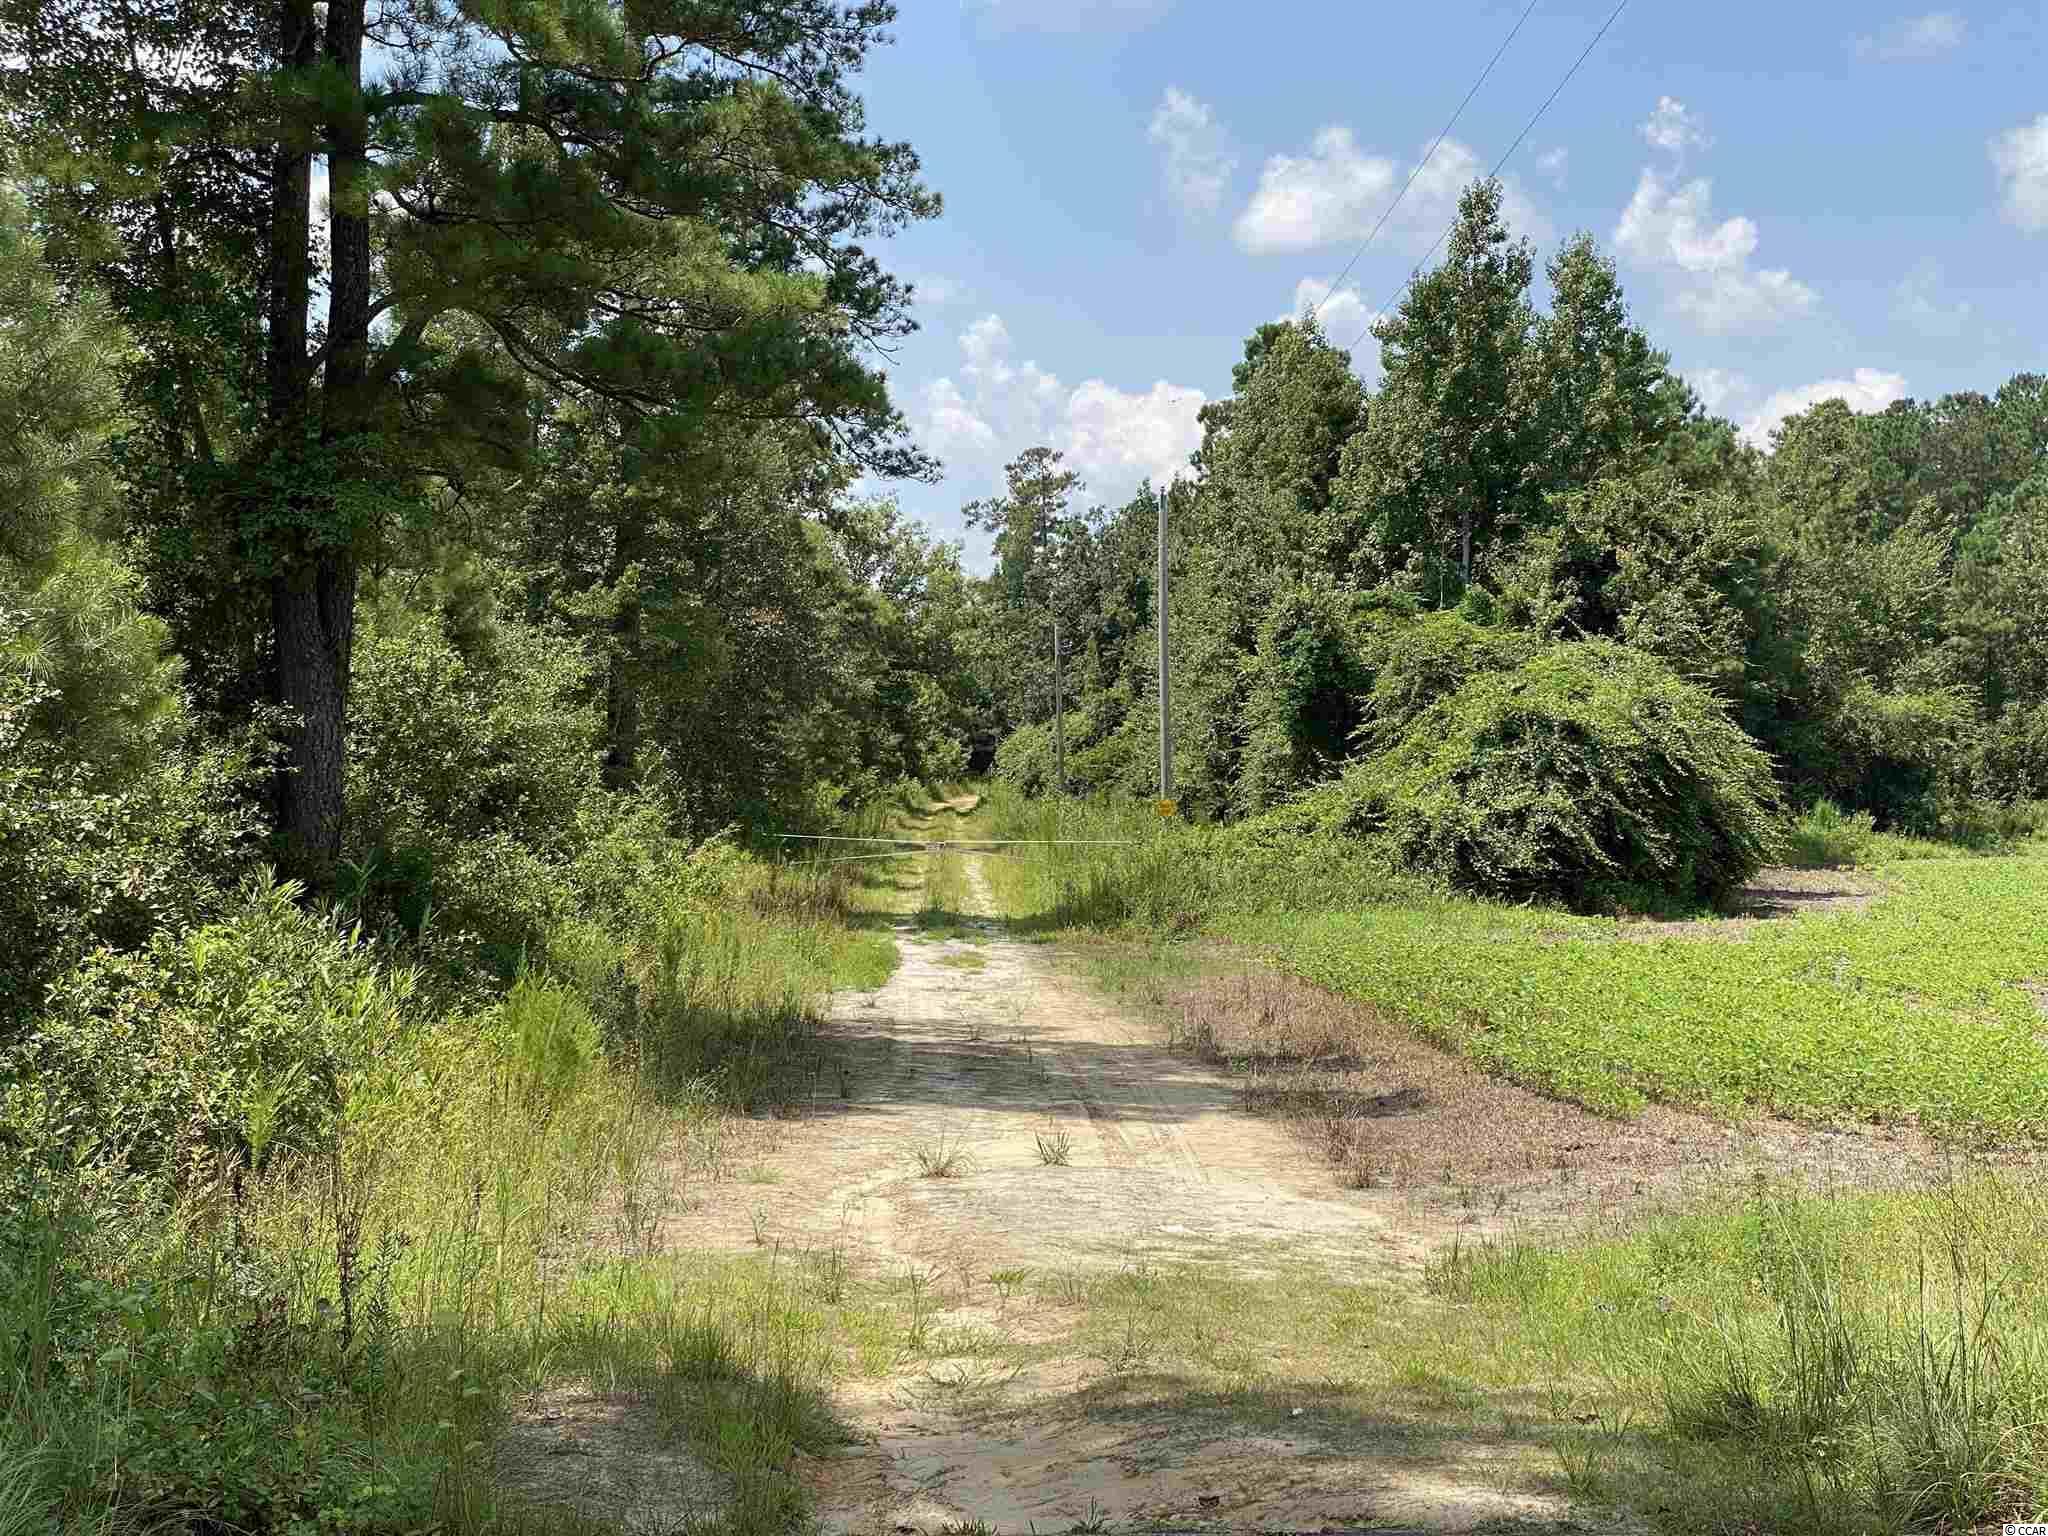 Tbd Highway 501 Property Photo 24